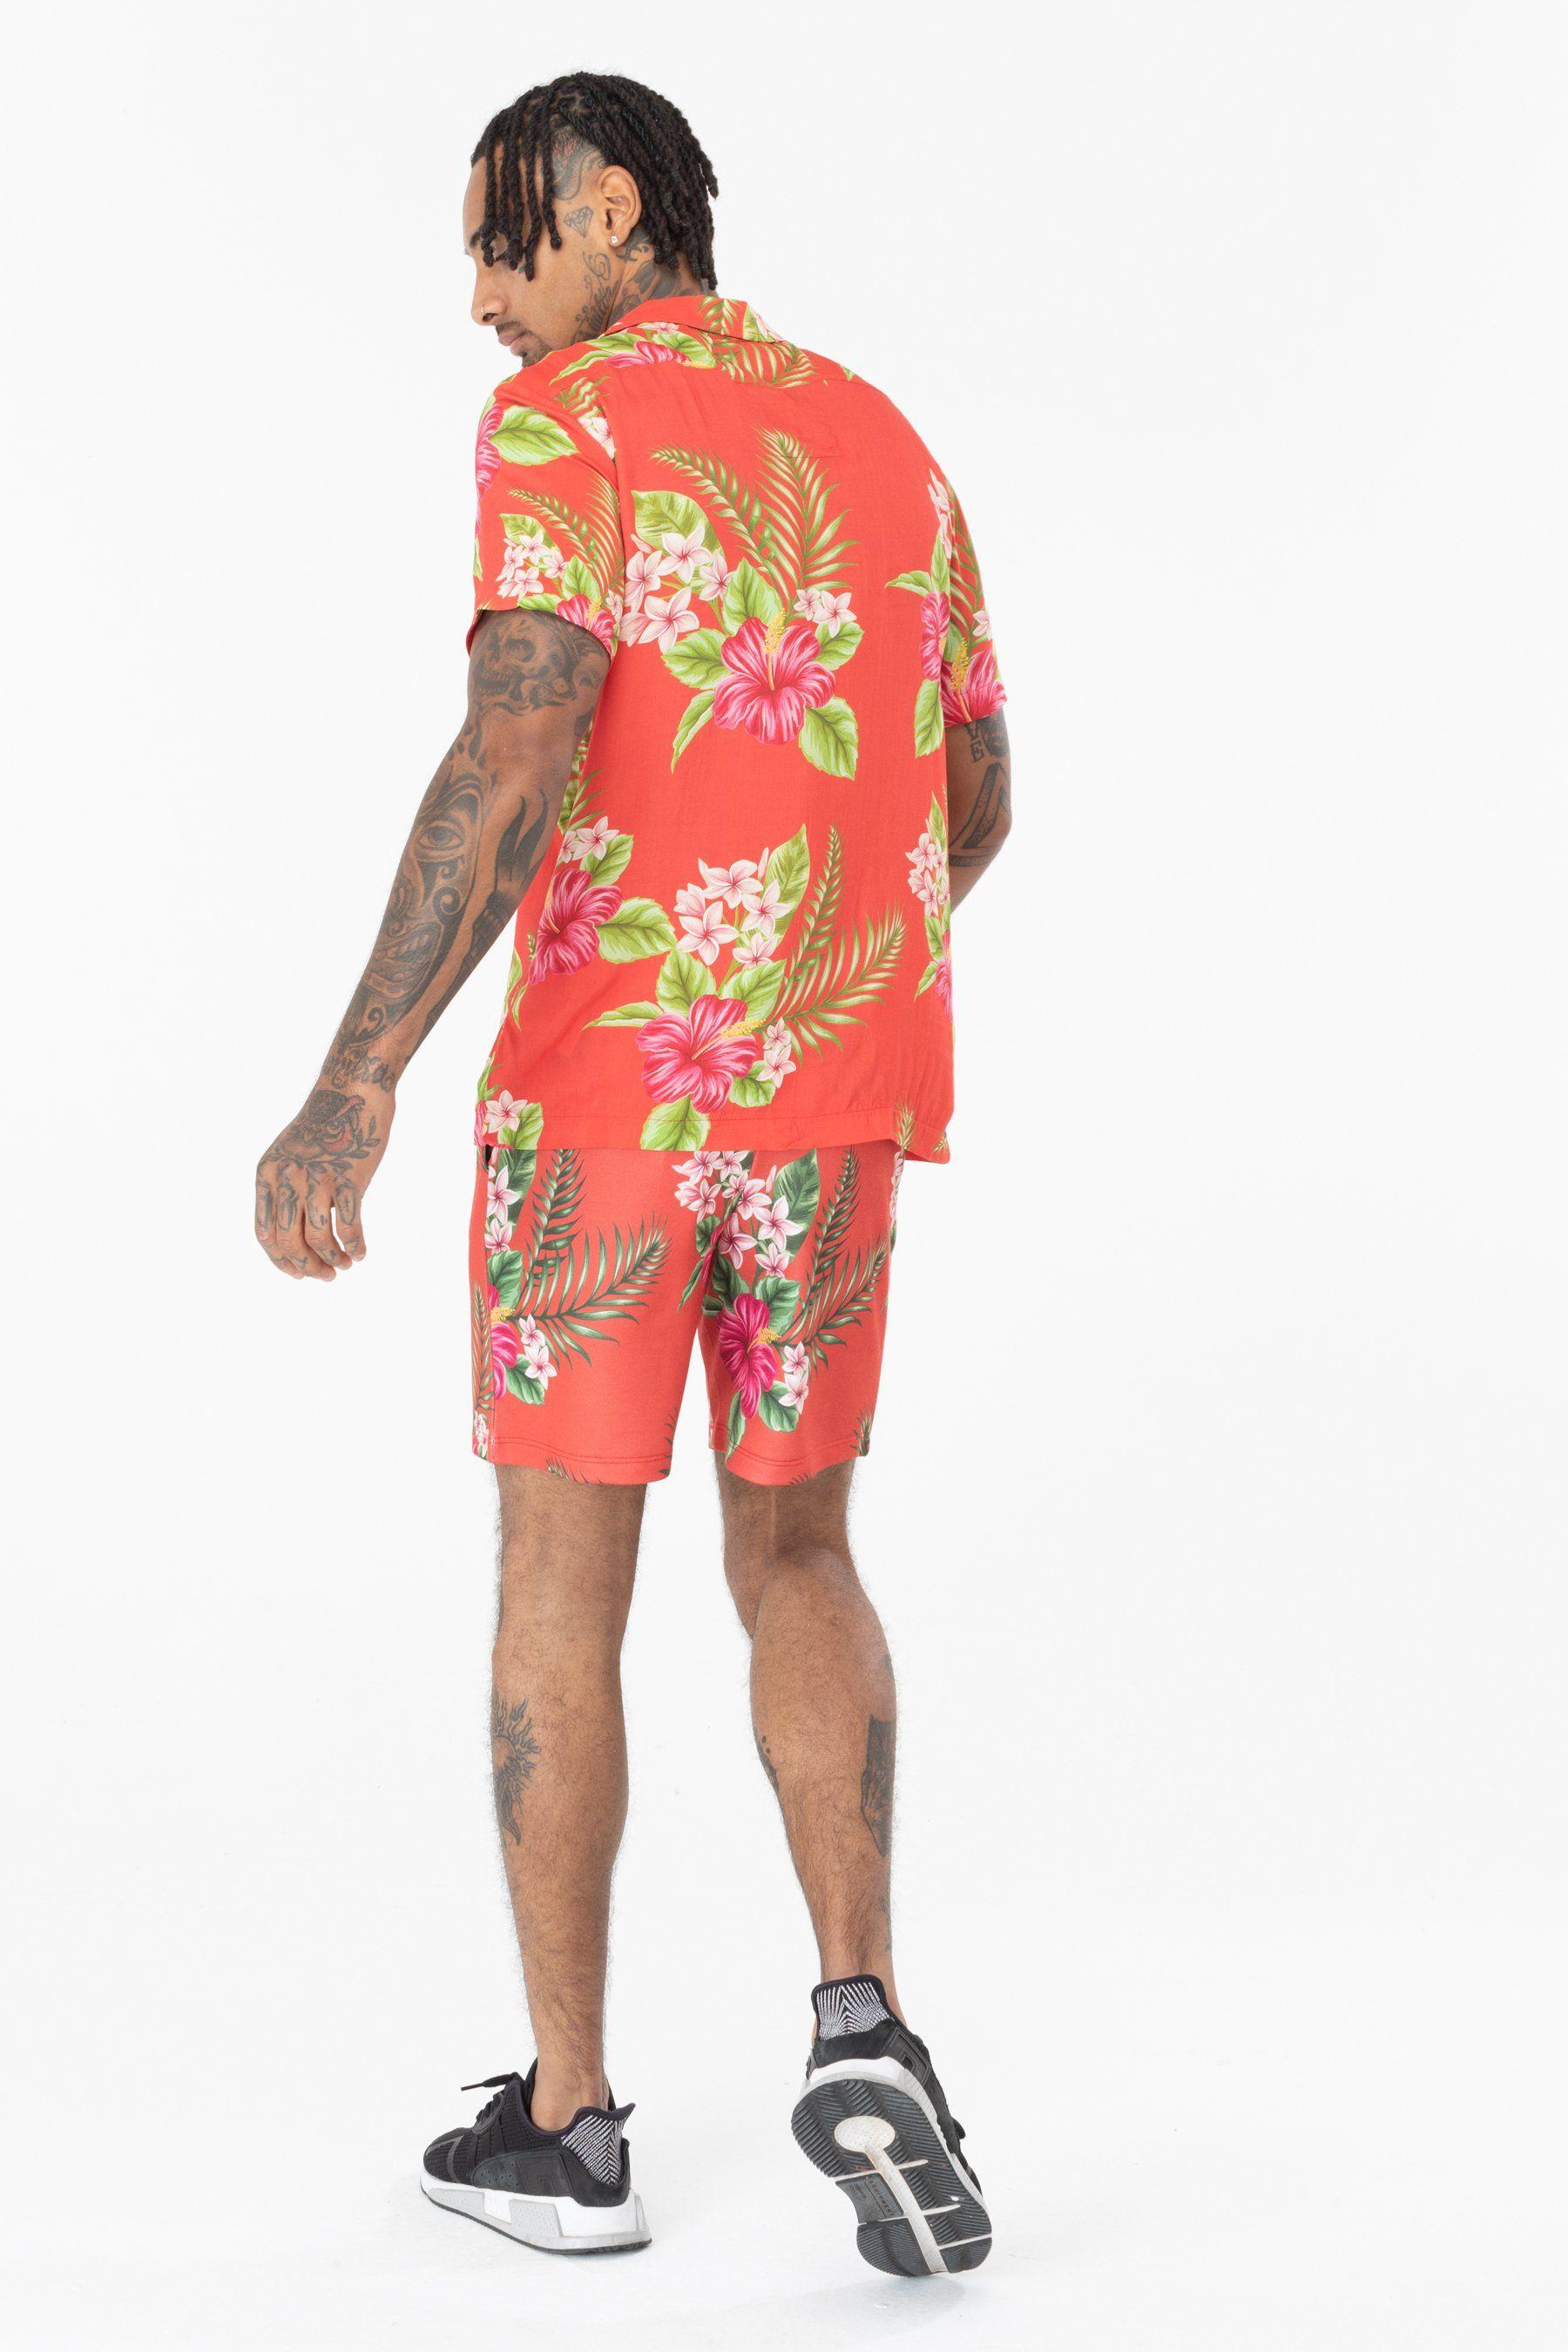 Hype Red Hawaii Mens Shirt